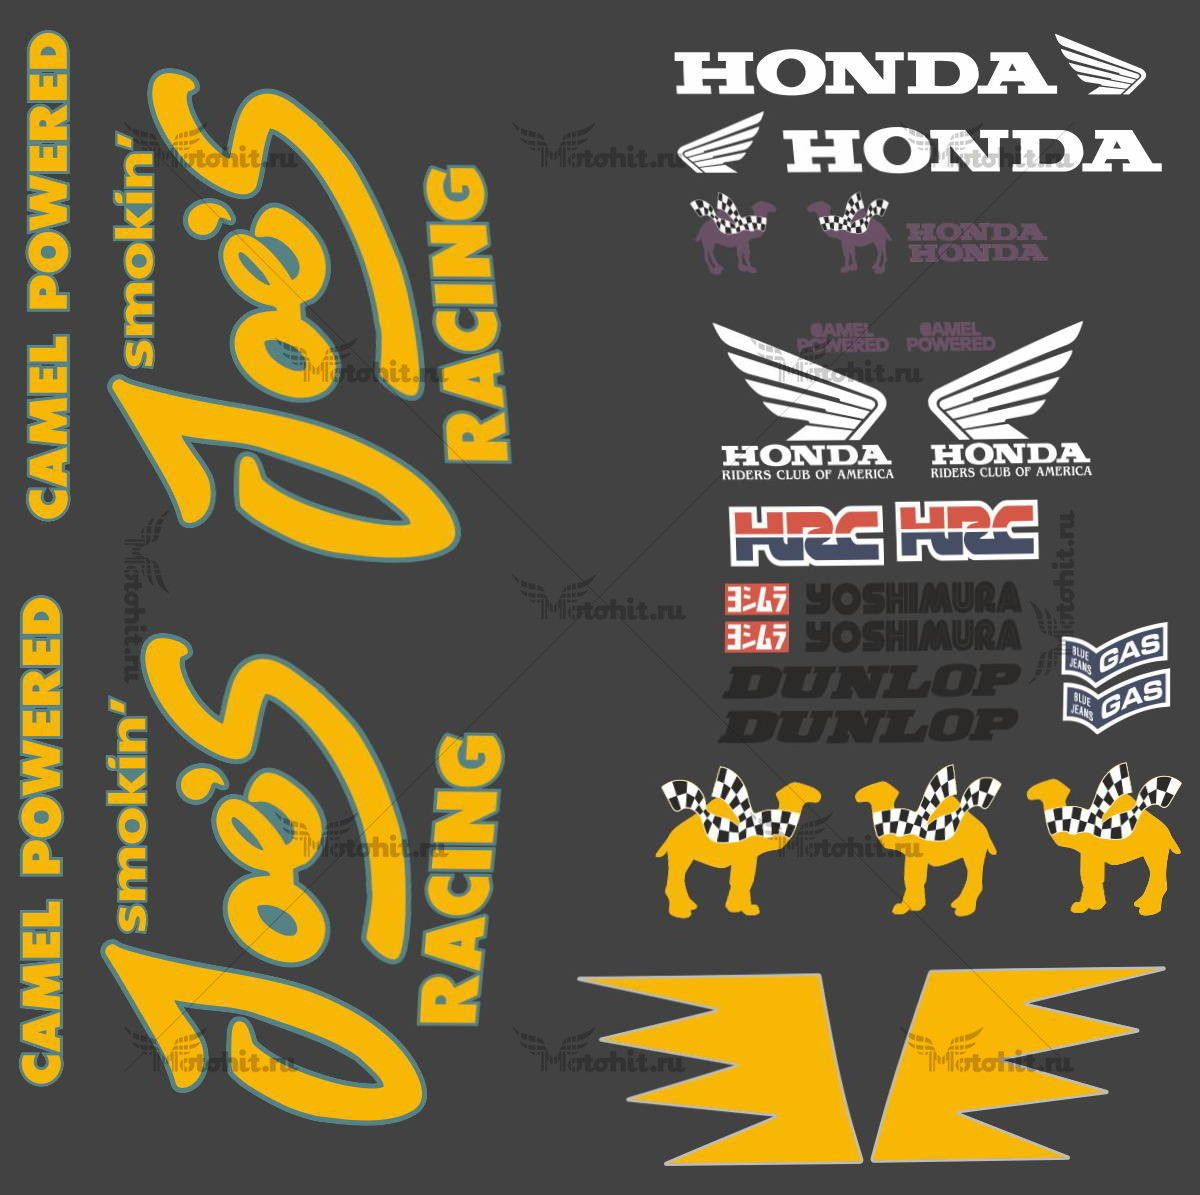 Комплект наклеек Honda CBR-400-F CAMEL